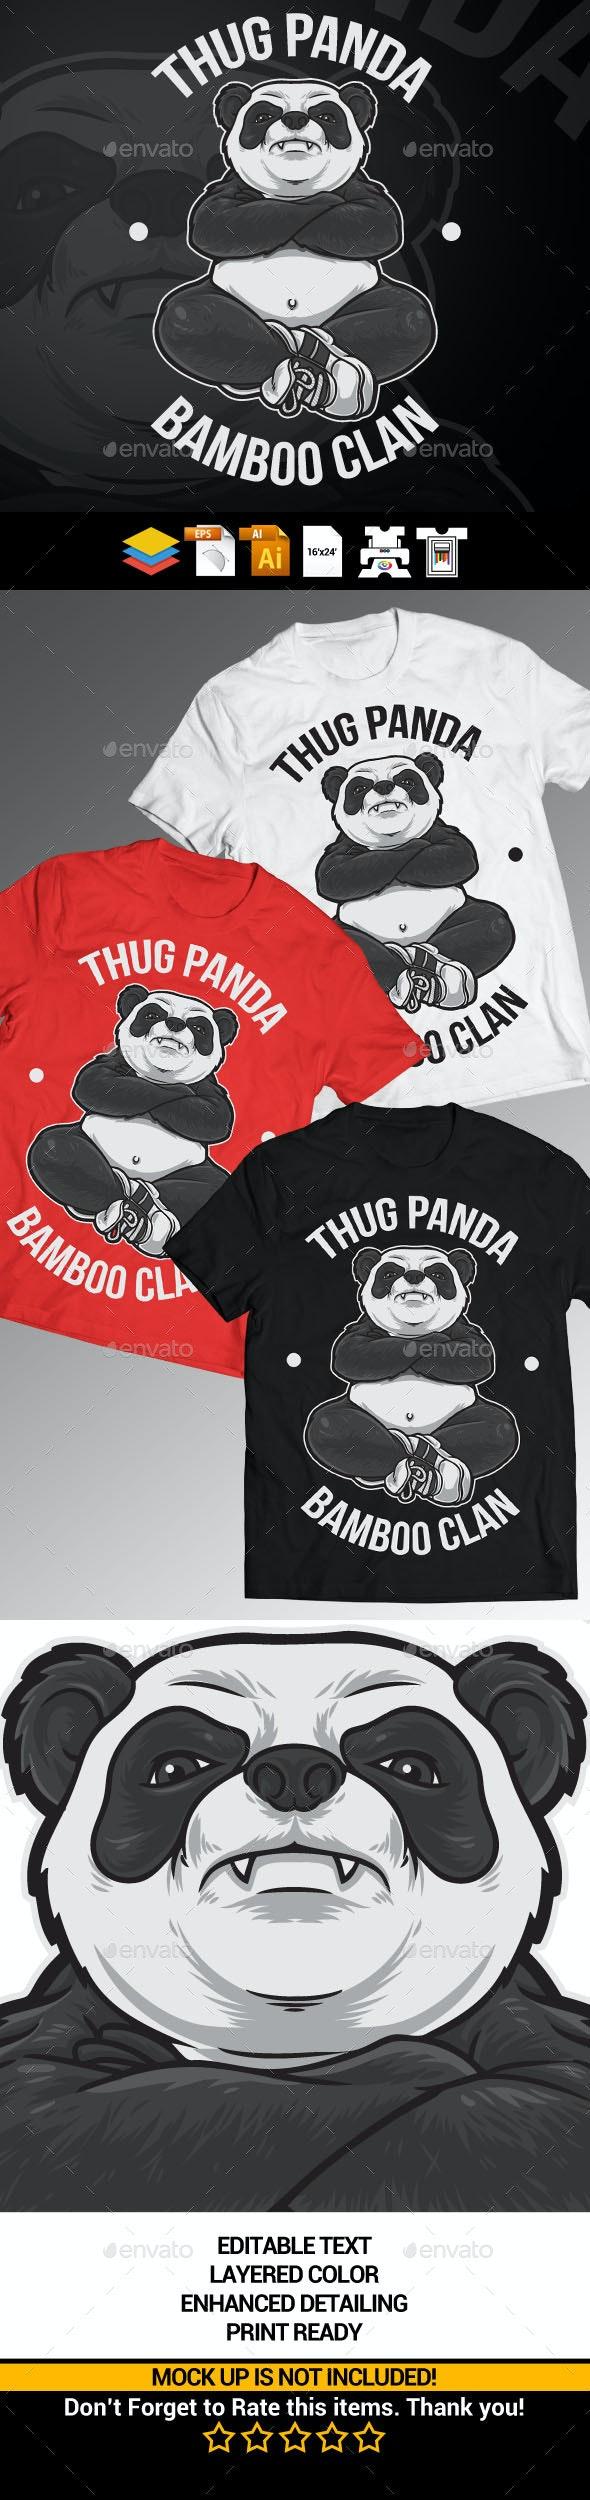 Thug Panda - Designs T-Shirts